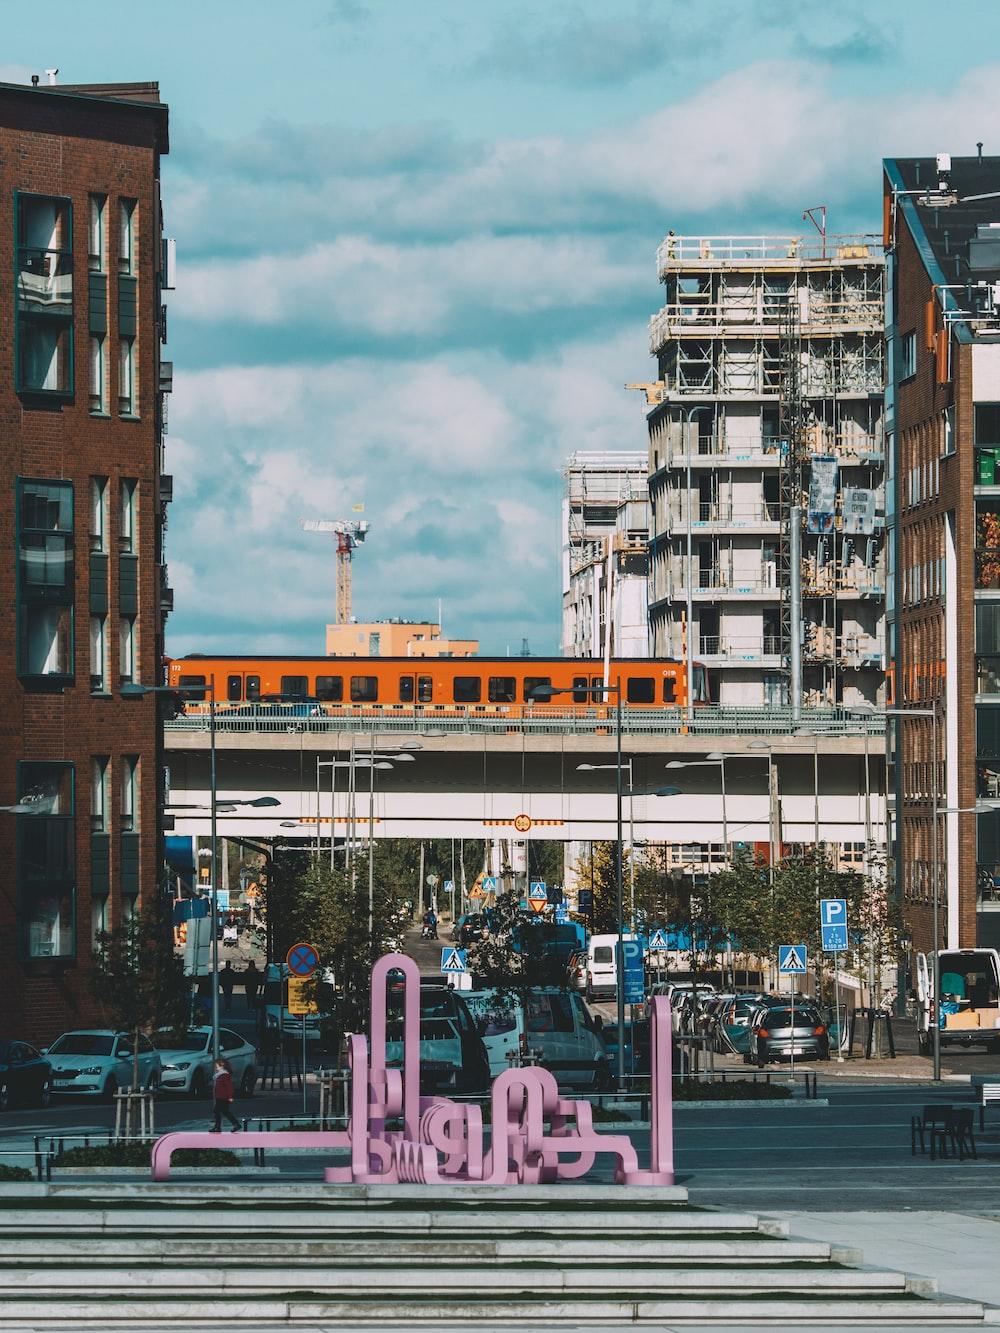 pink frames near buildings